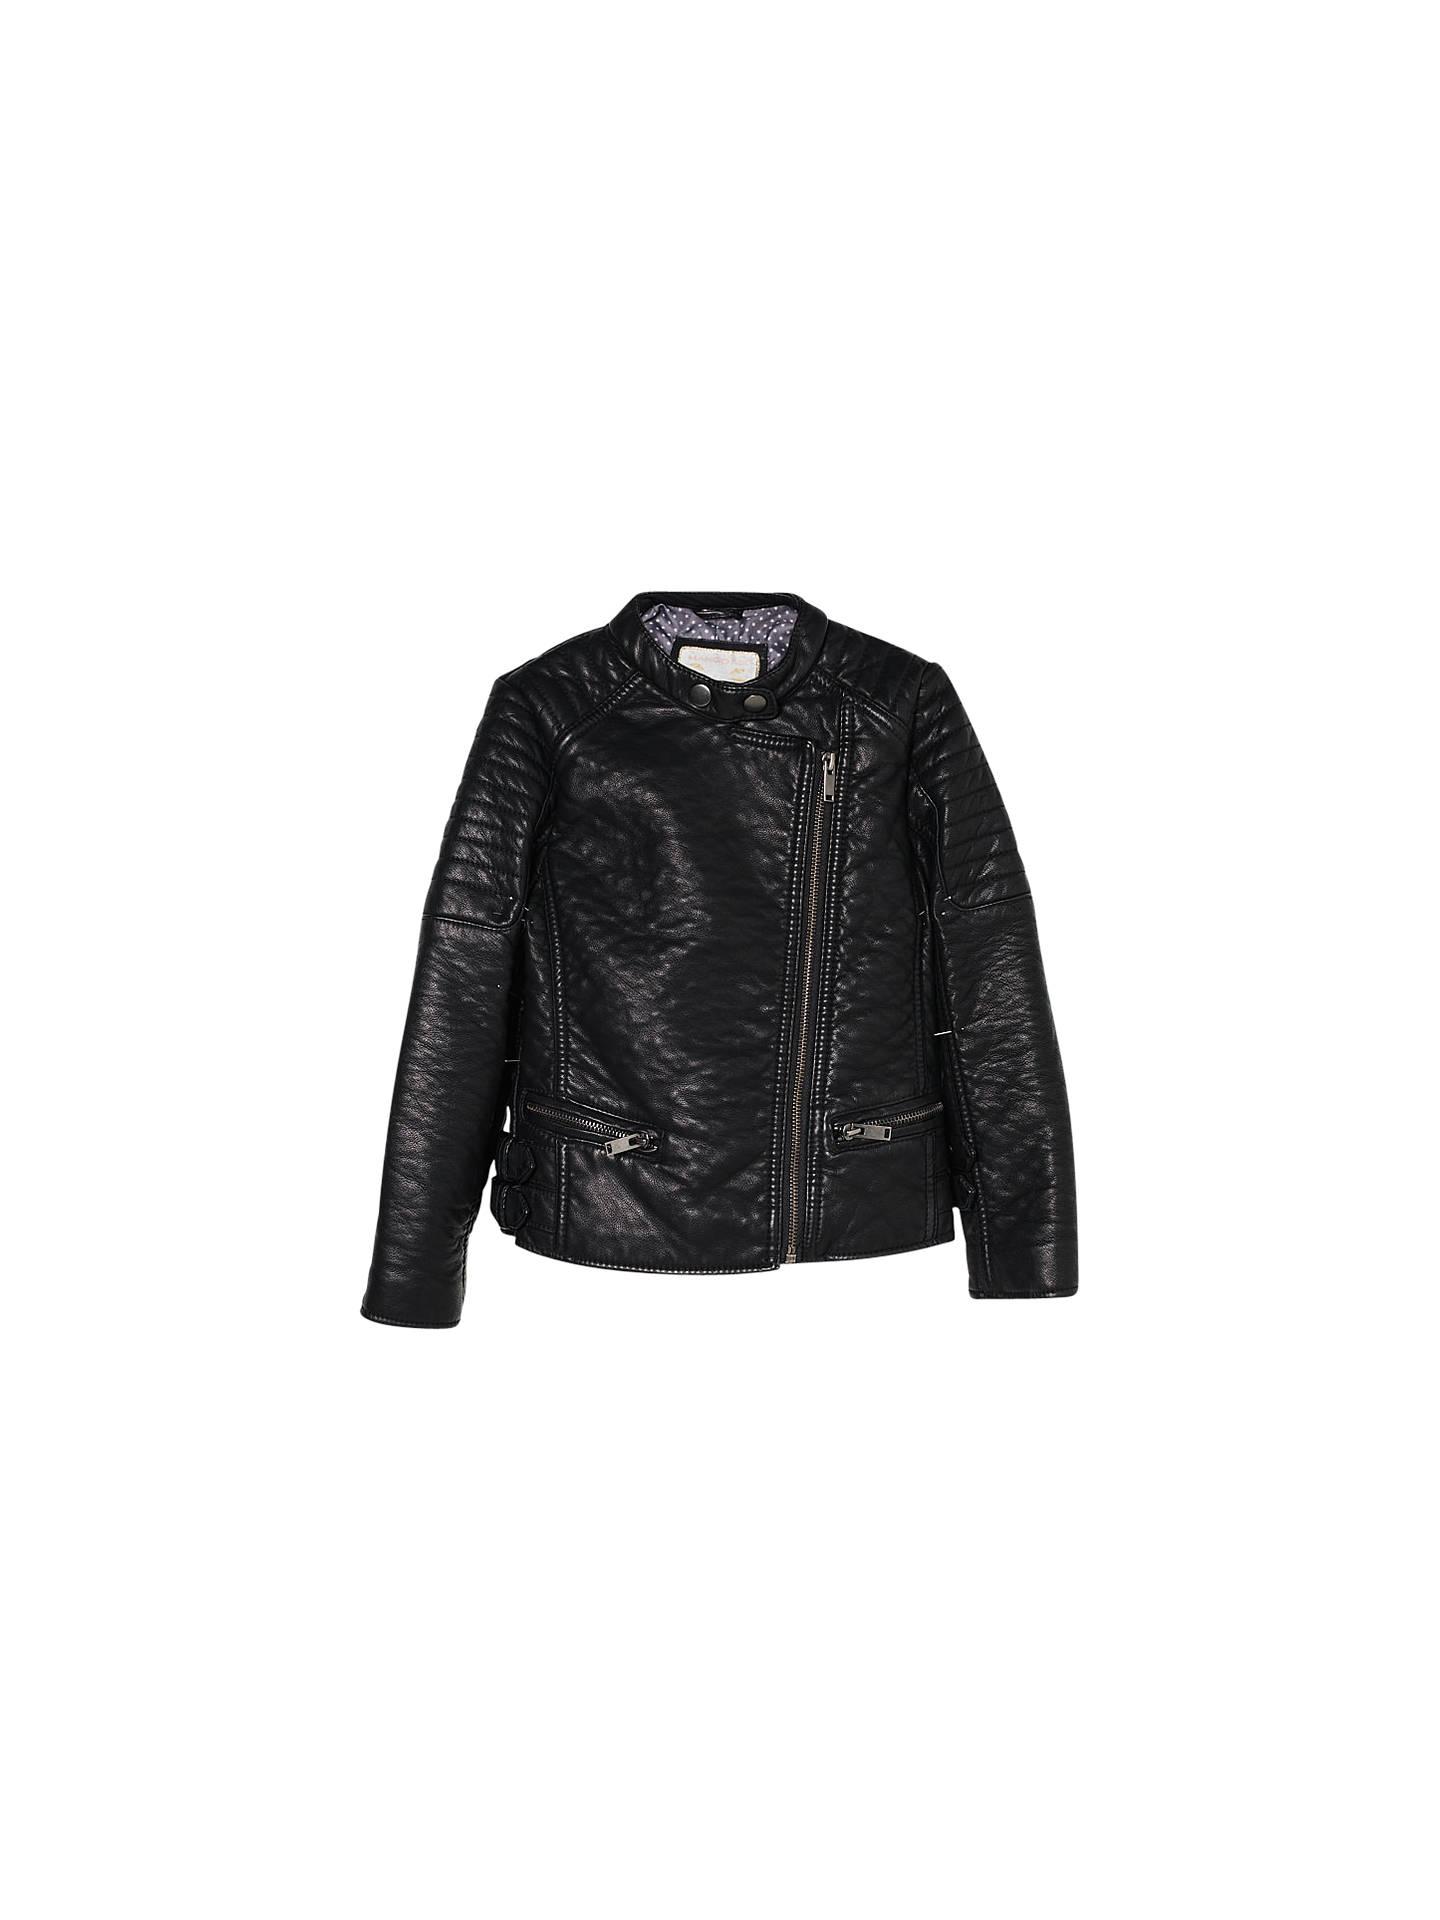 bc474a9c6 Mango Kids Girls  Faux Leather Biker Jacket at John Lewis   Partners